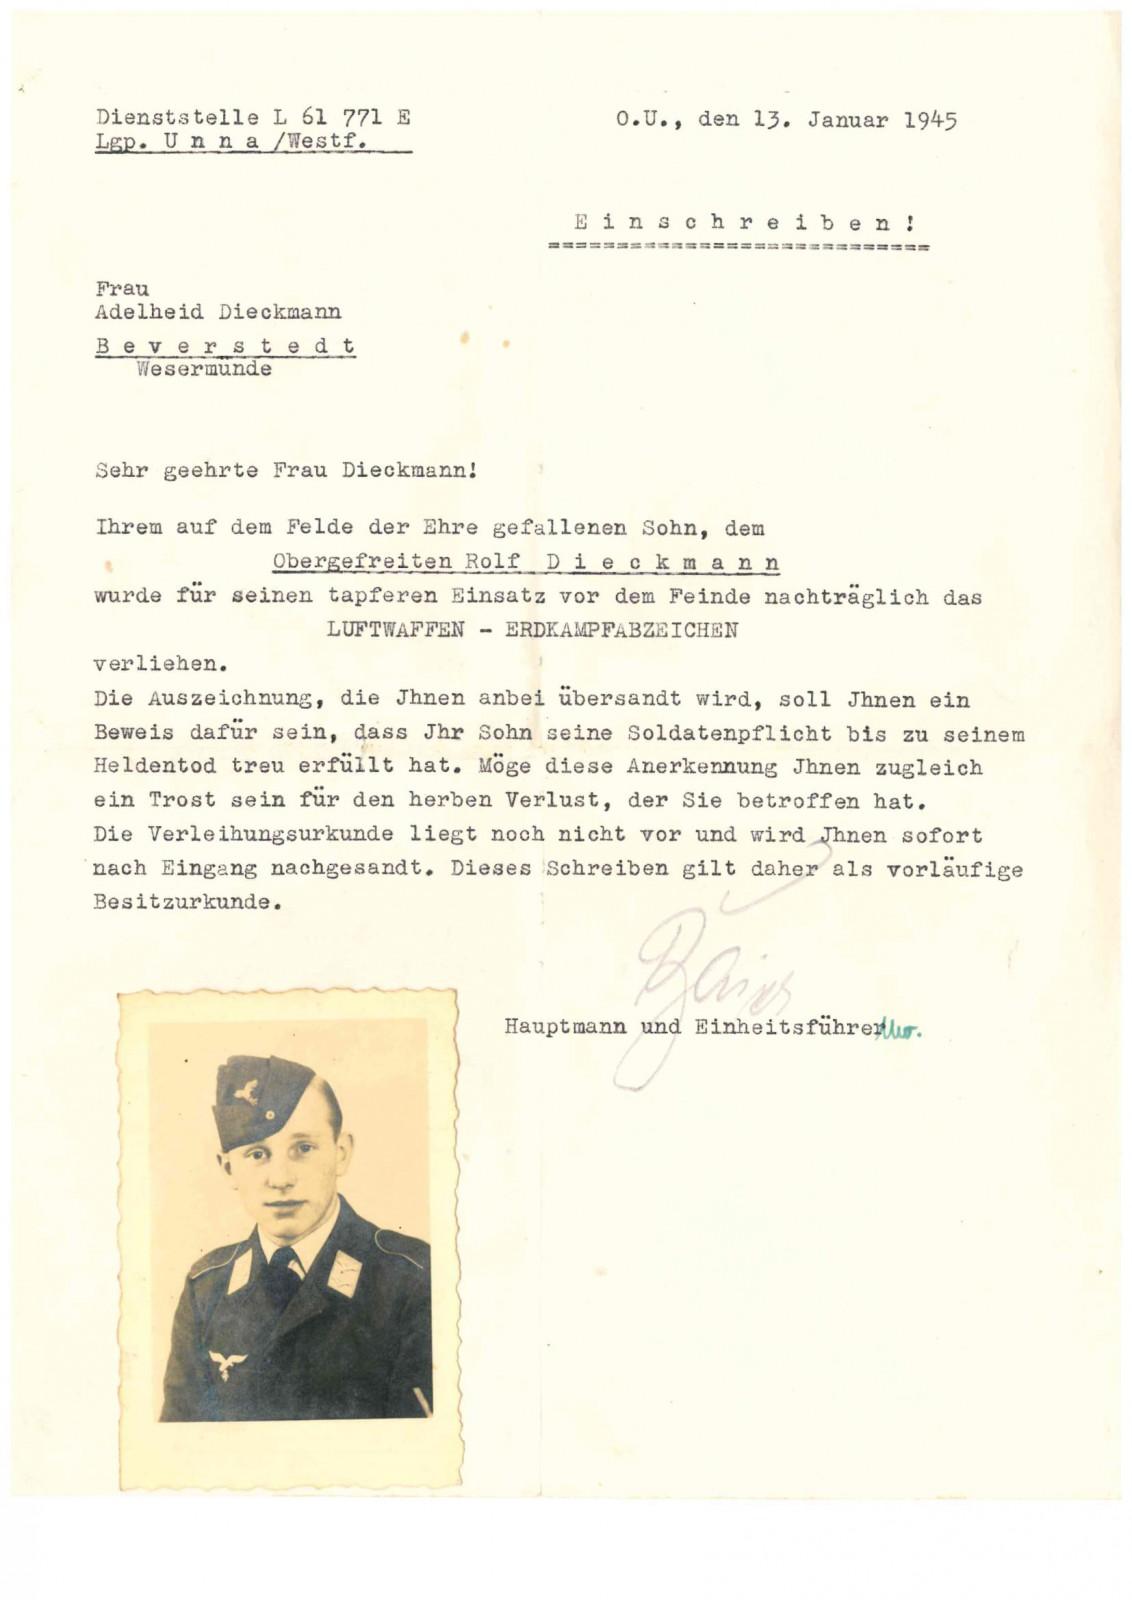 Rolf Dieckmann